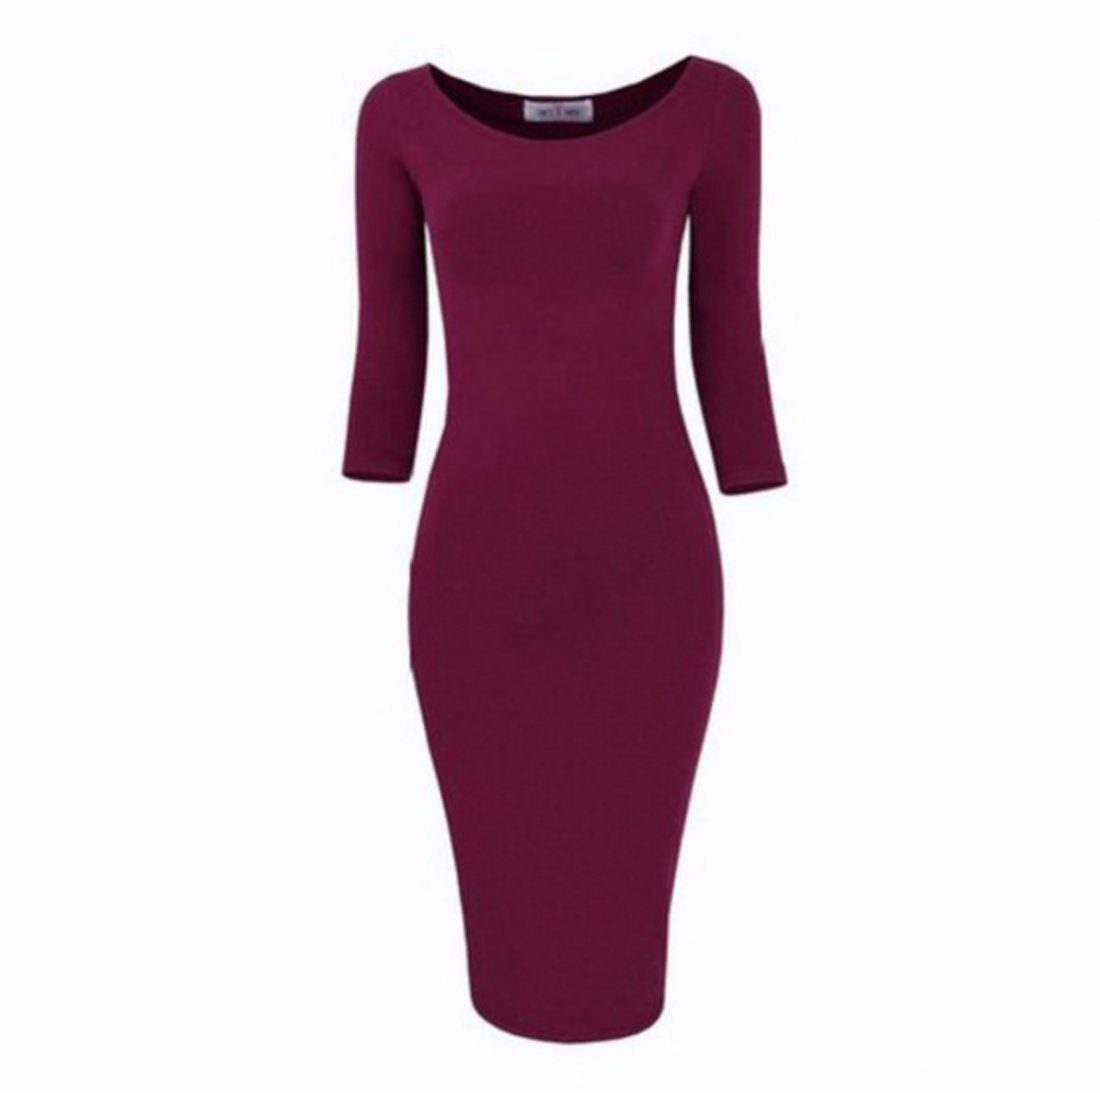 M0172 red1 Long Sleeve Dresses maureens.com boutique